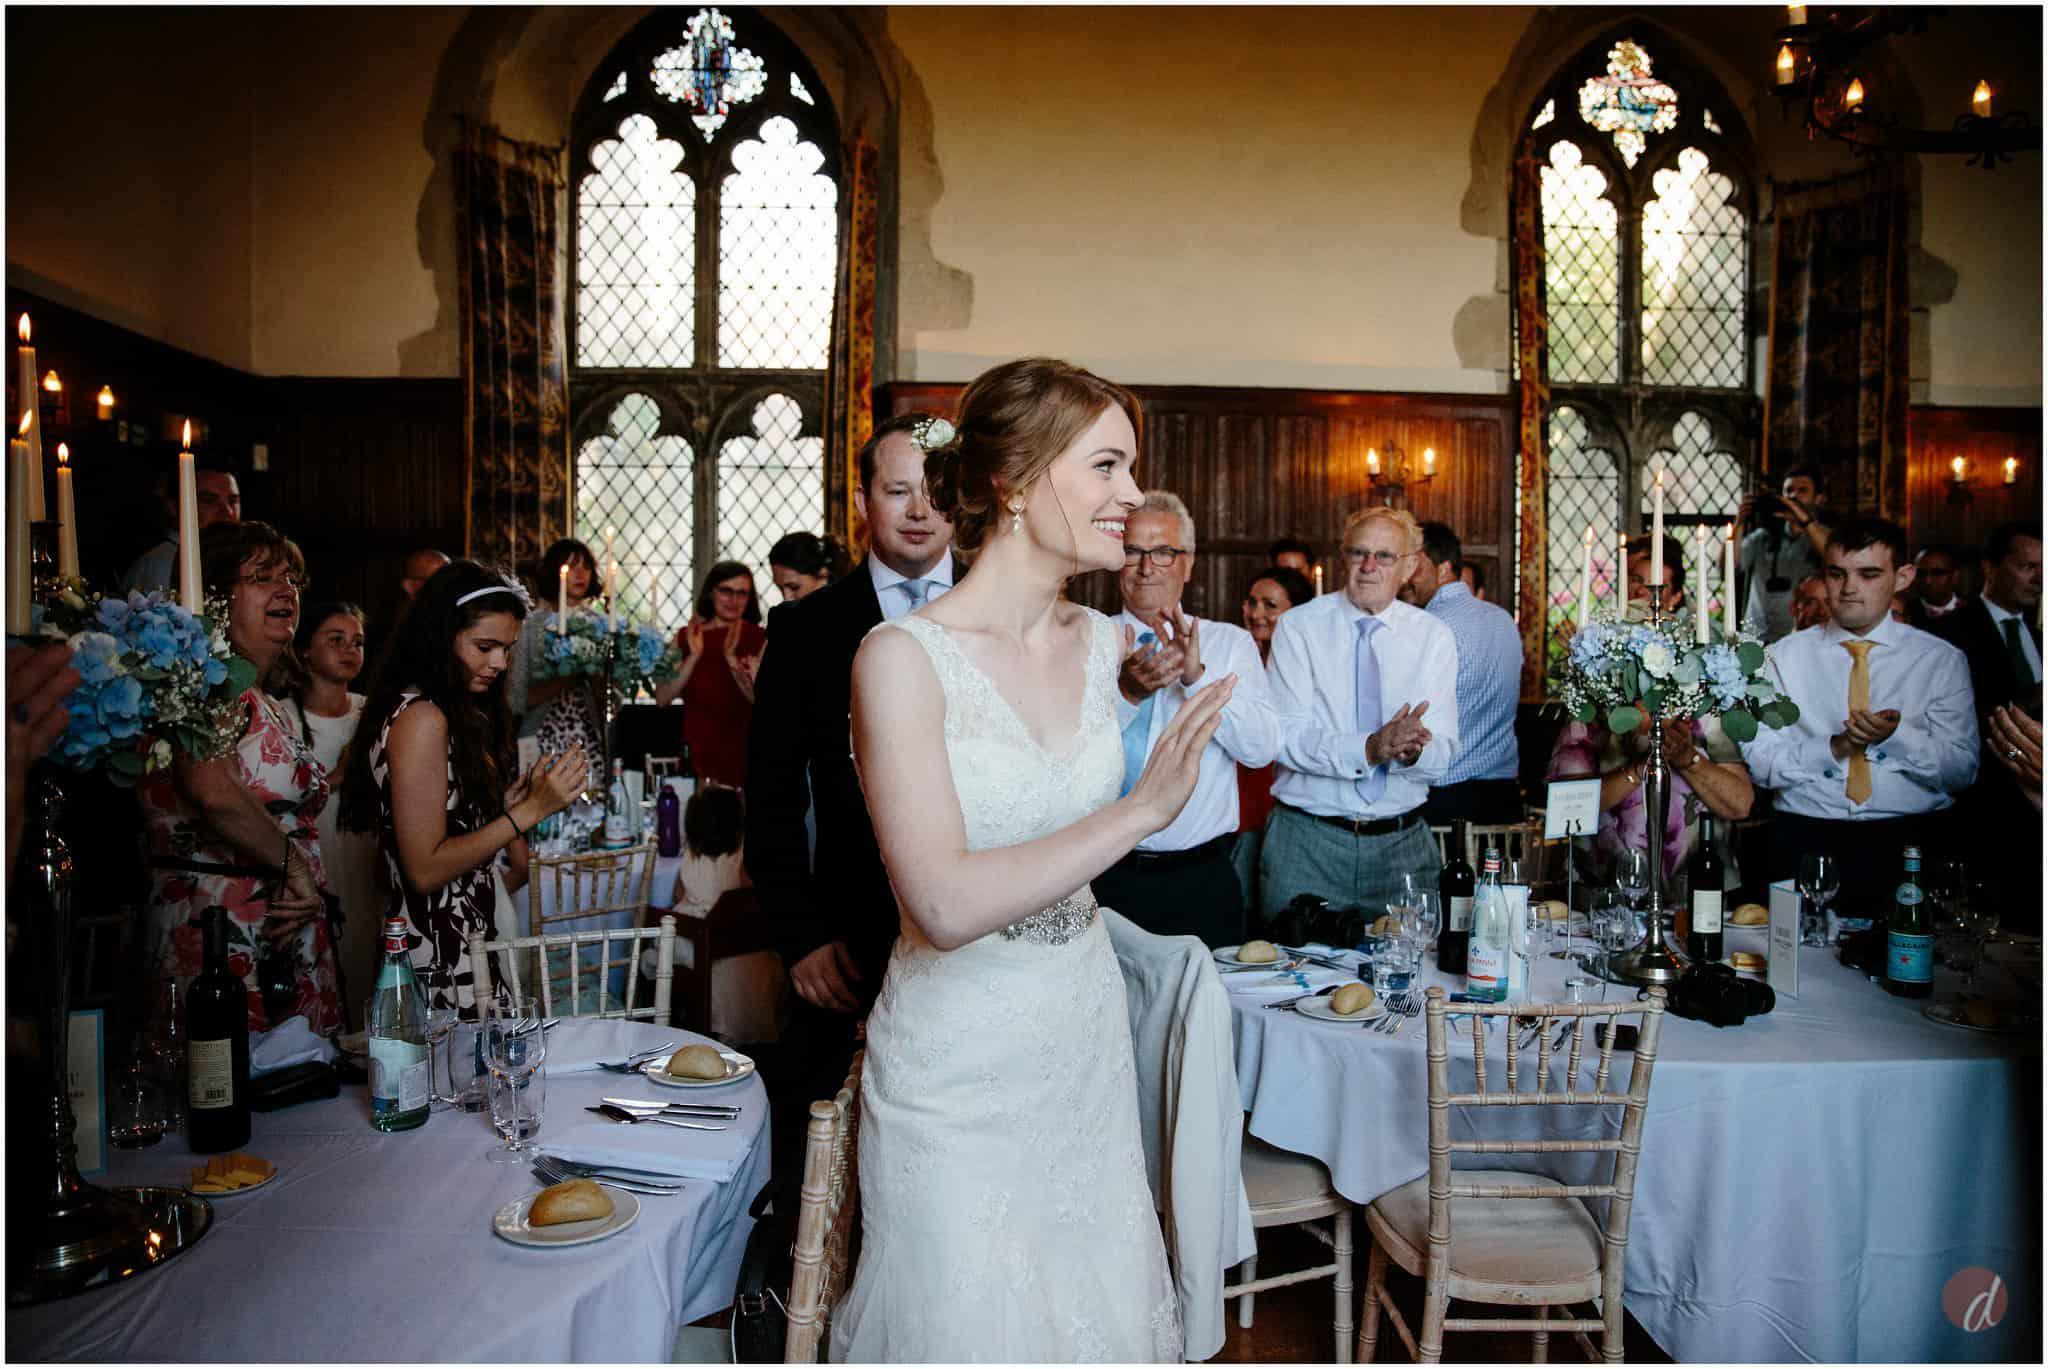 ride and groom lympne castle wedding reception